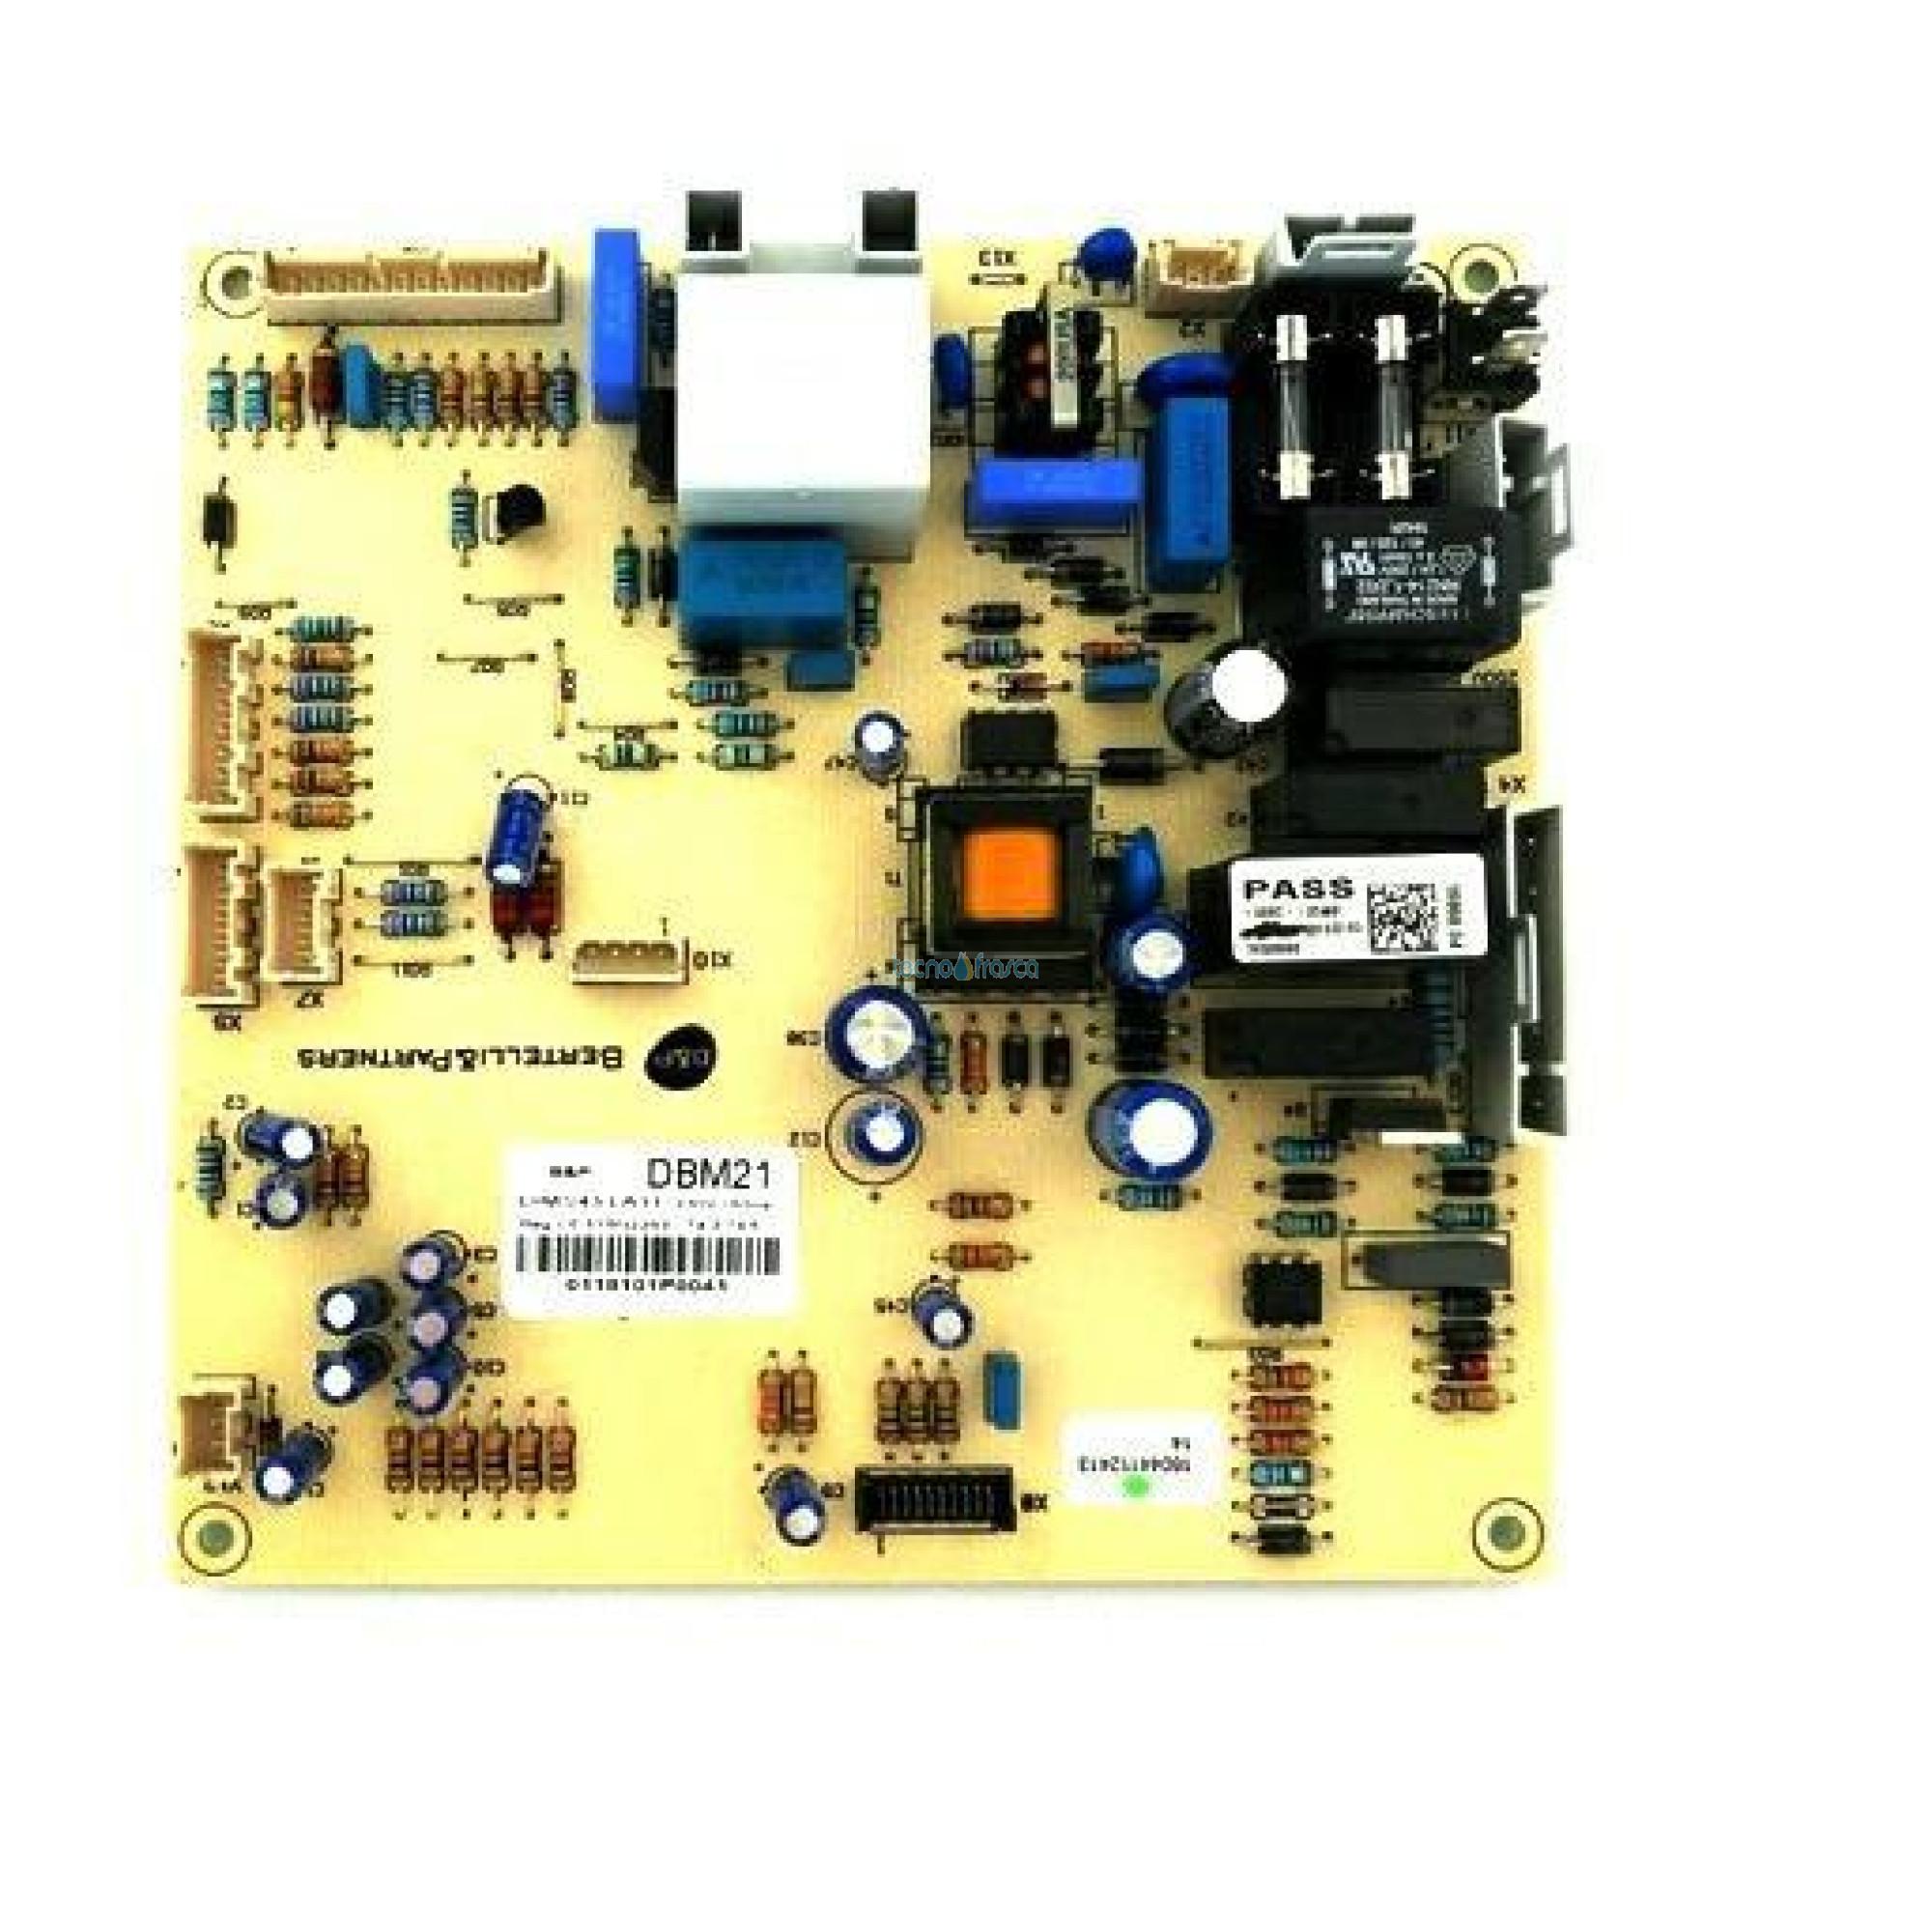 Lamborghini kit centralina elettronica f39835690